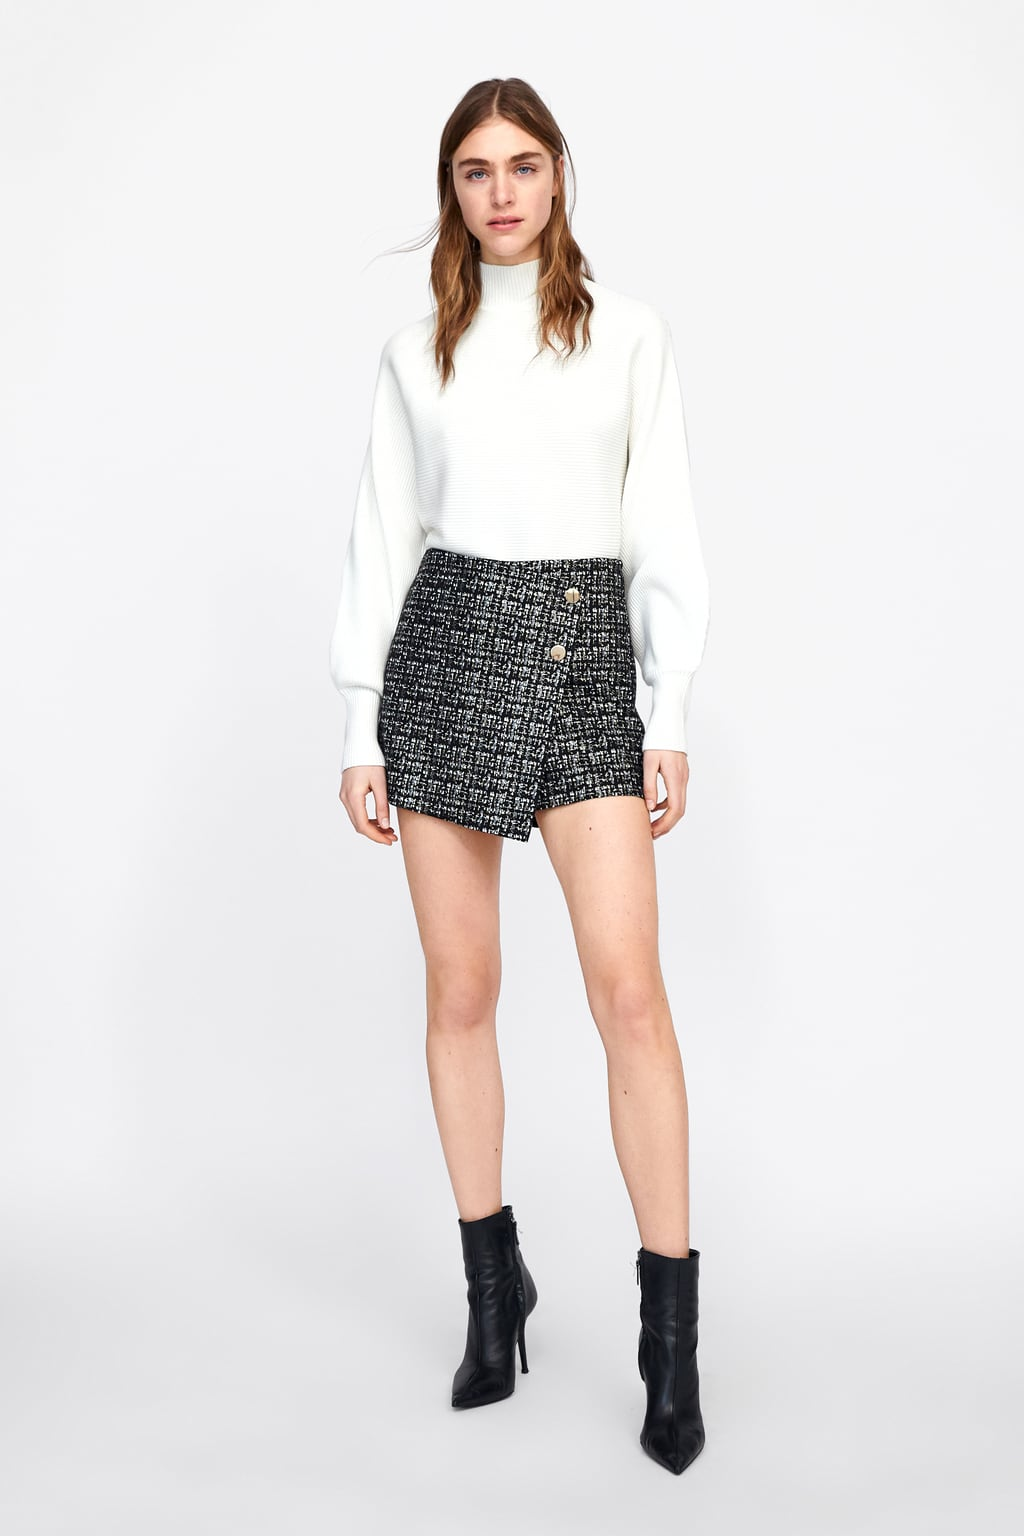 New Zara Must-haves